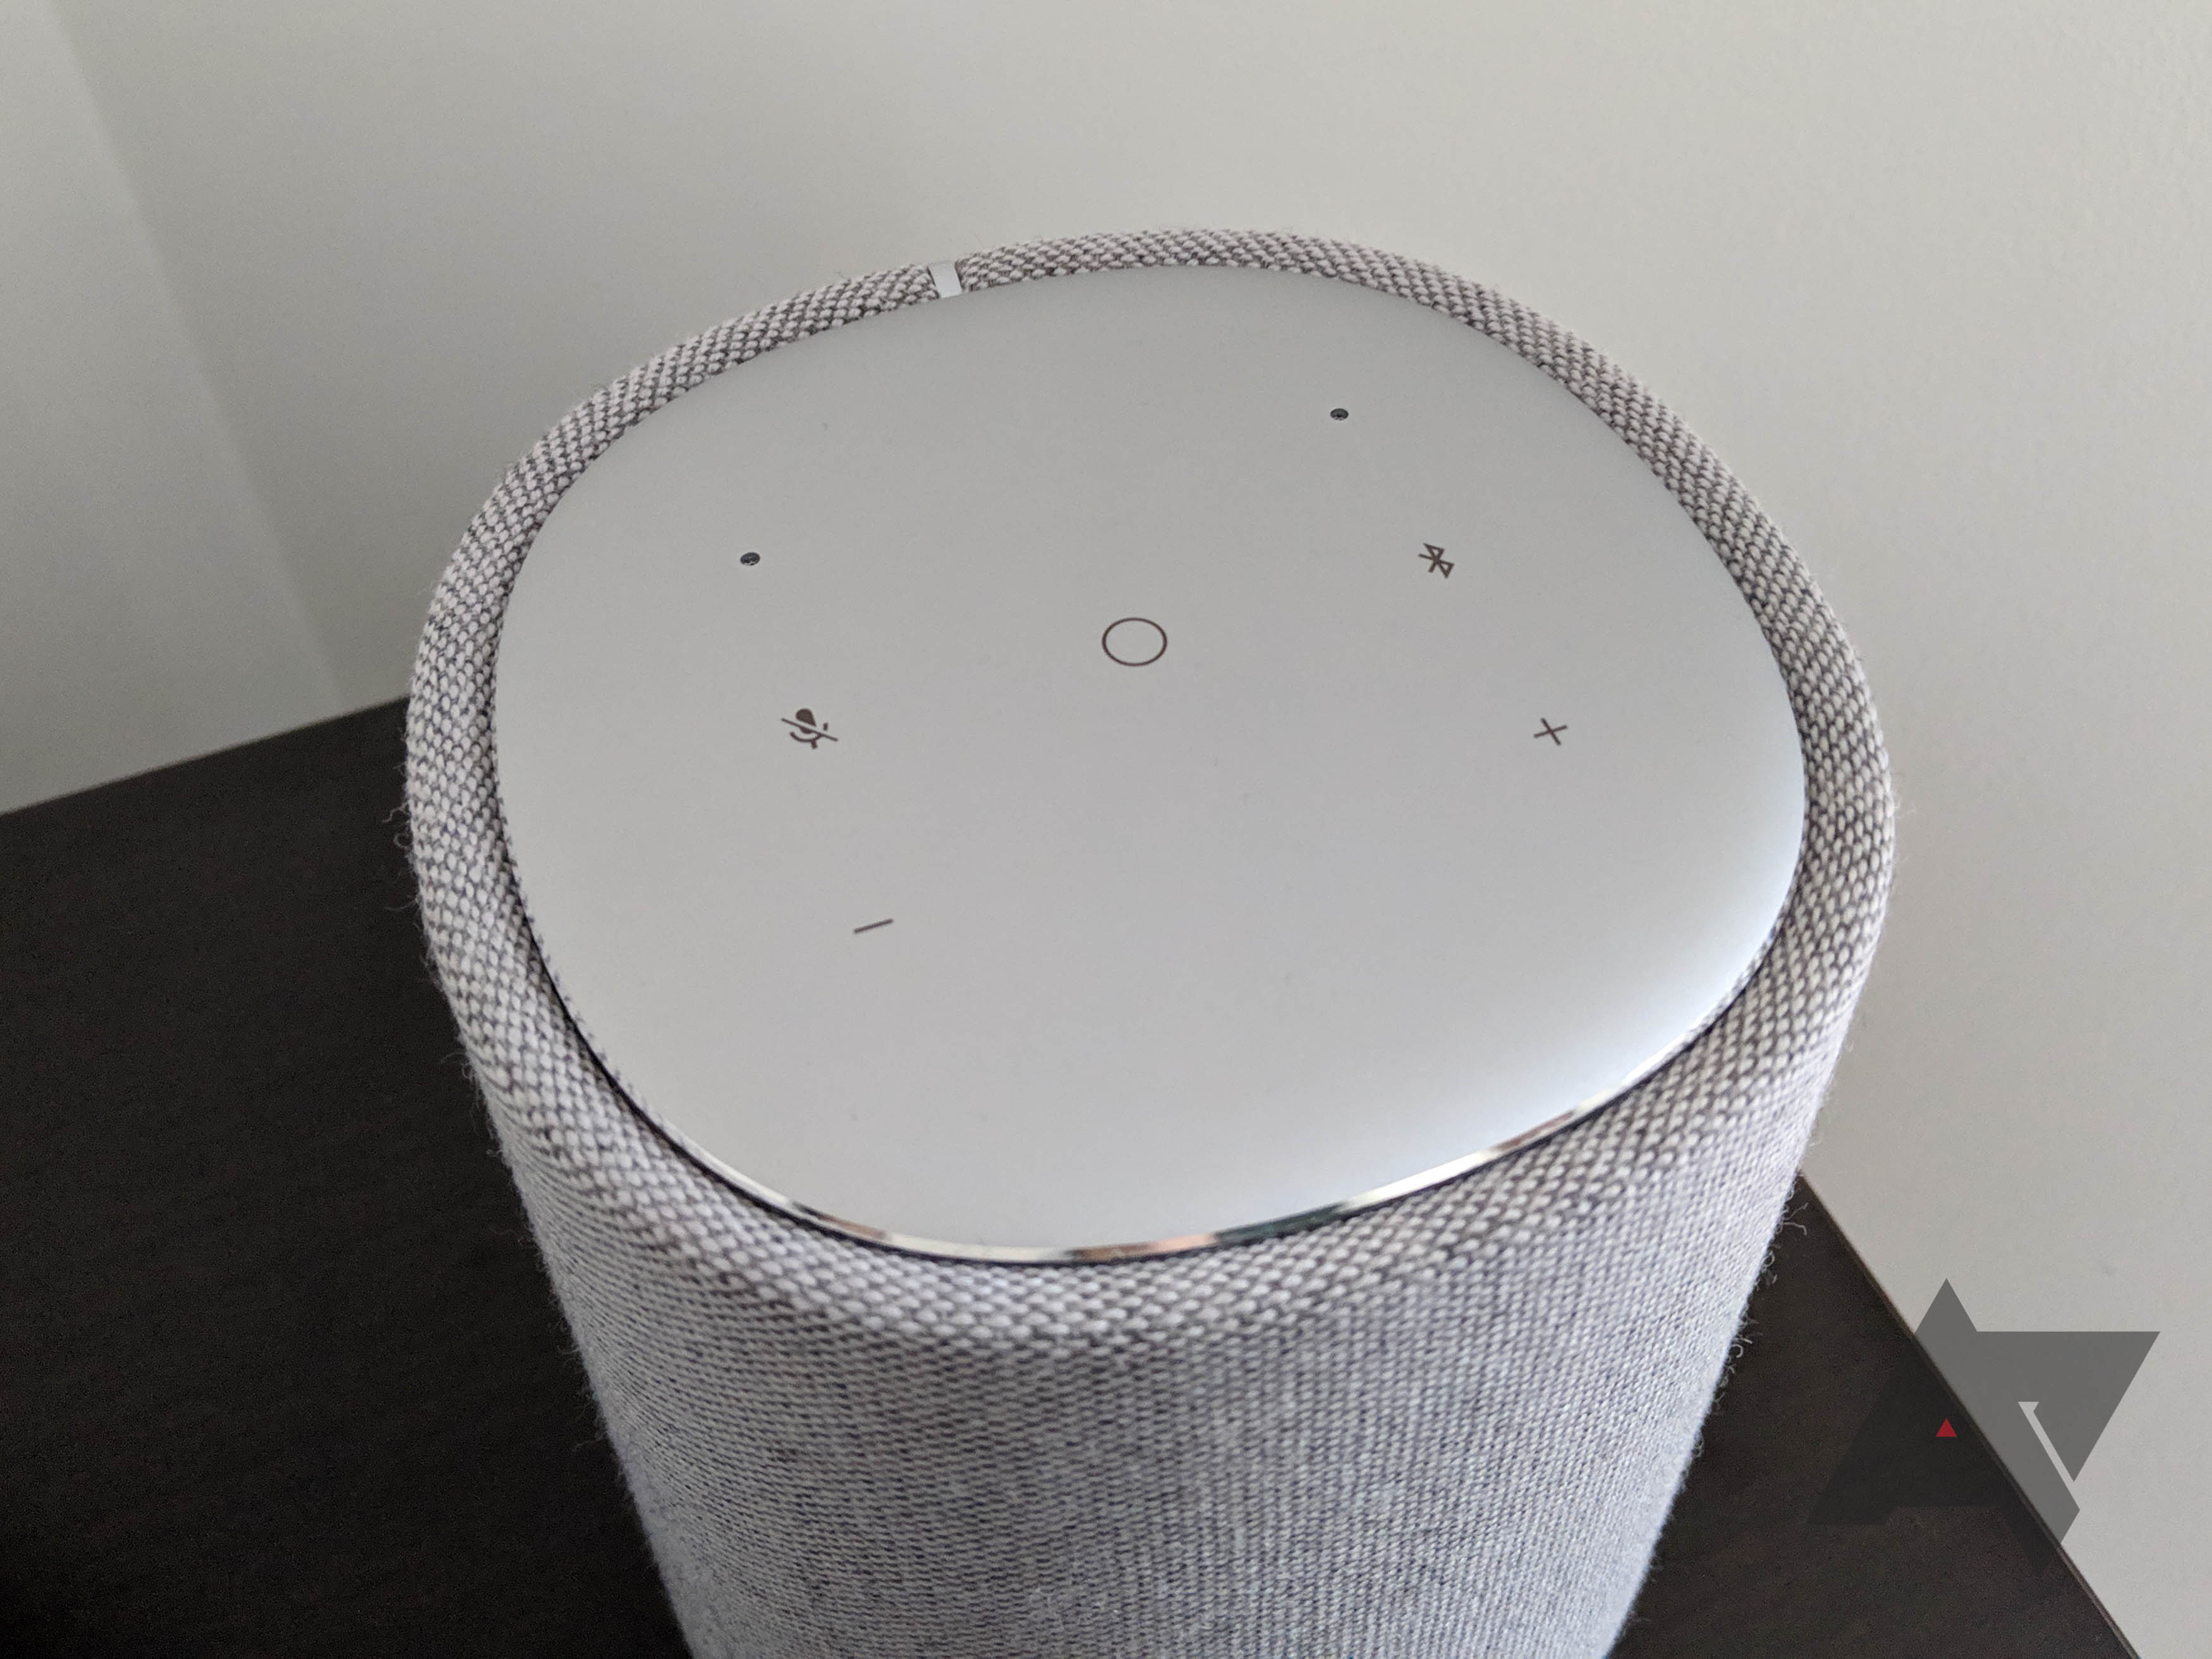 Harman Kardon Citation One review: The high-end Google Home